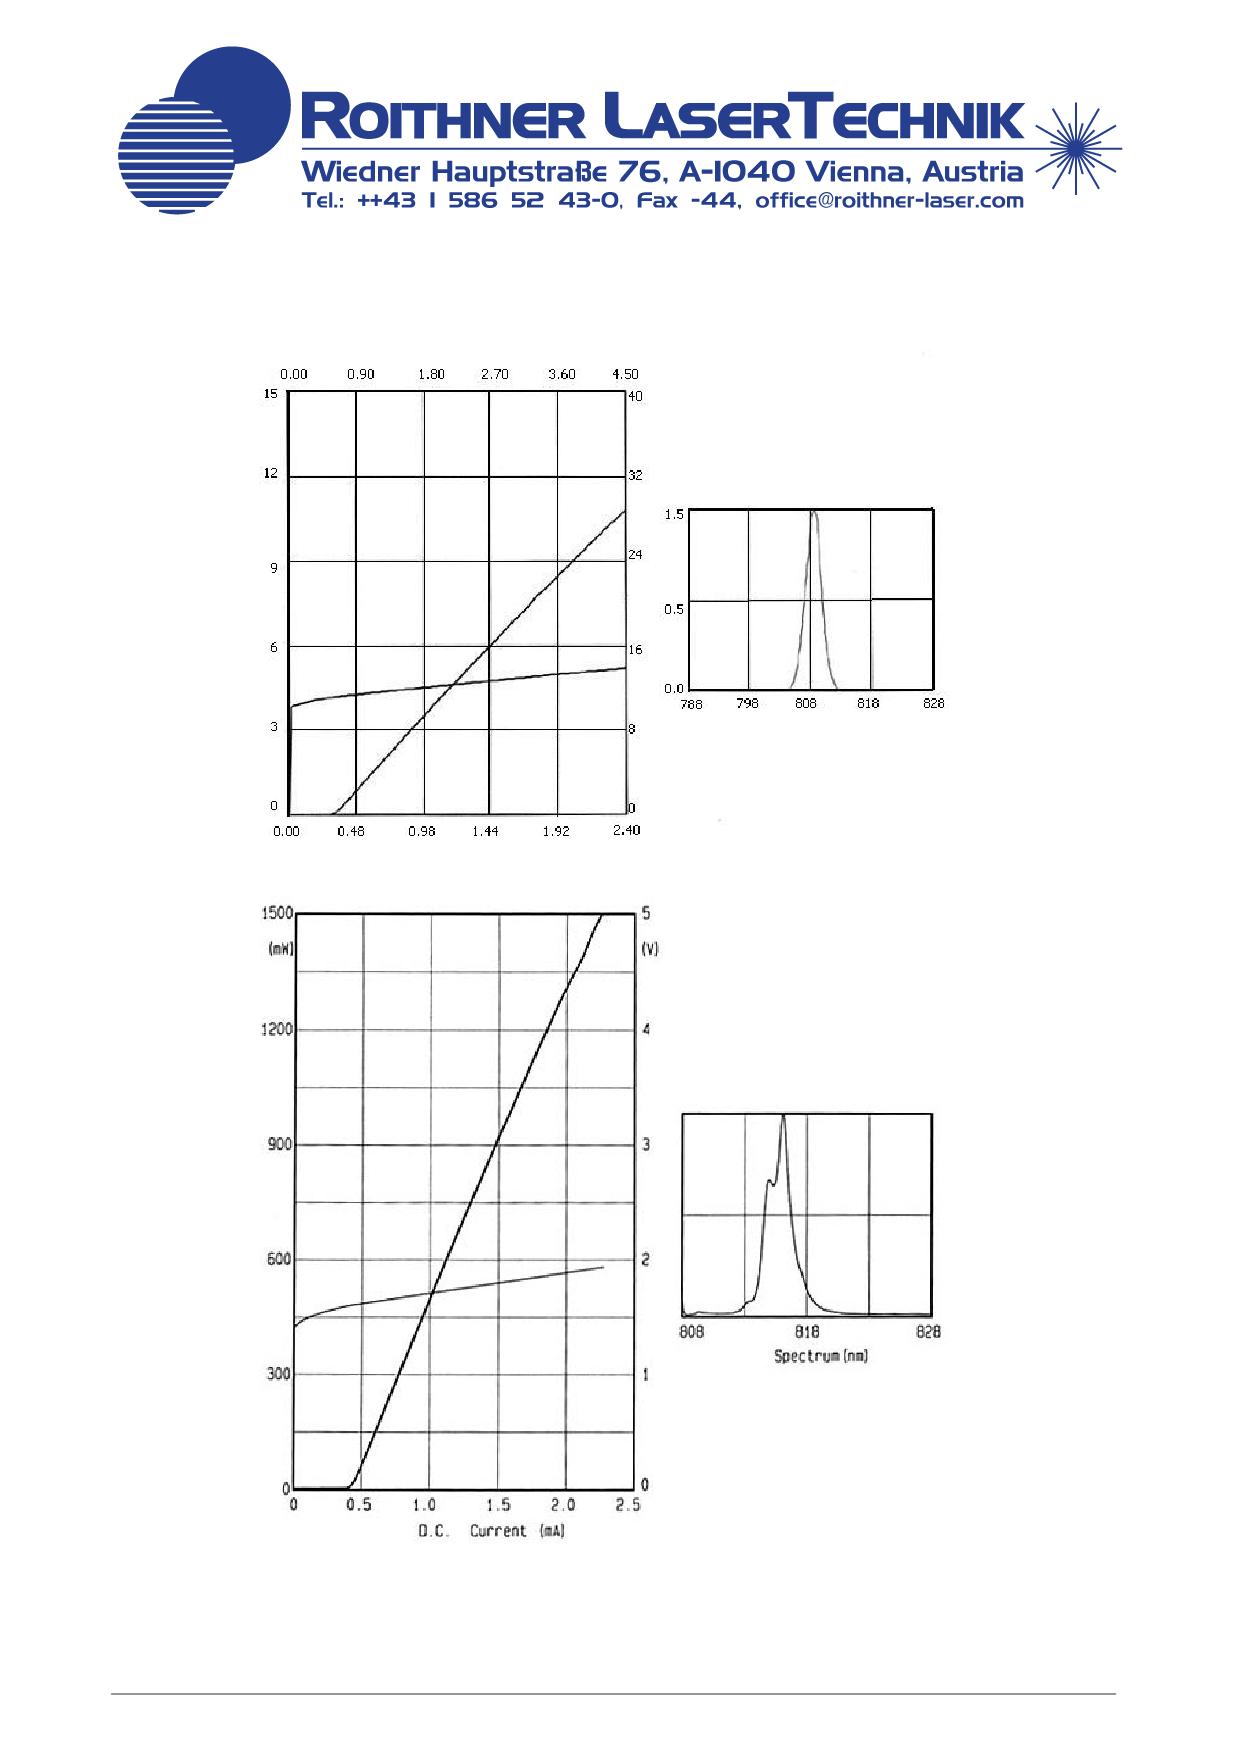 G081PU325W pdf, 電子部品, 半導体, ピン配列